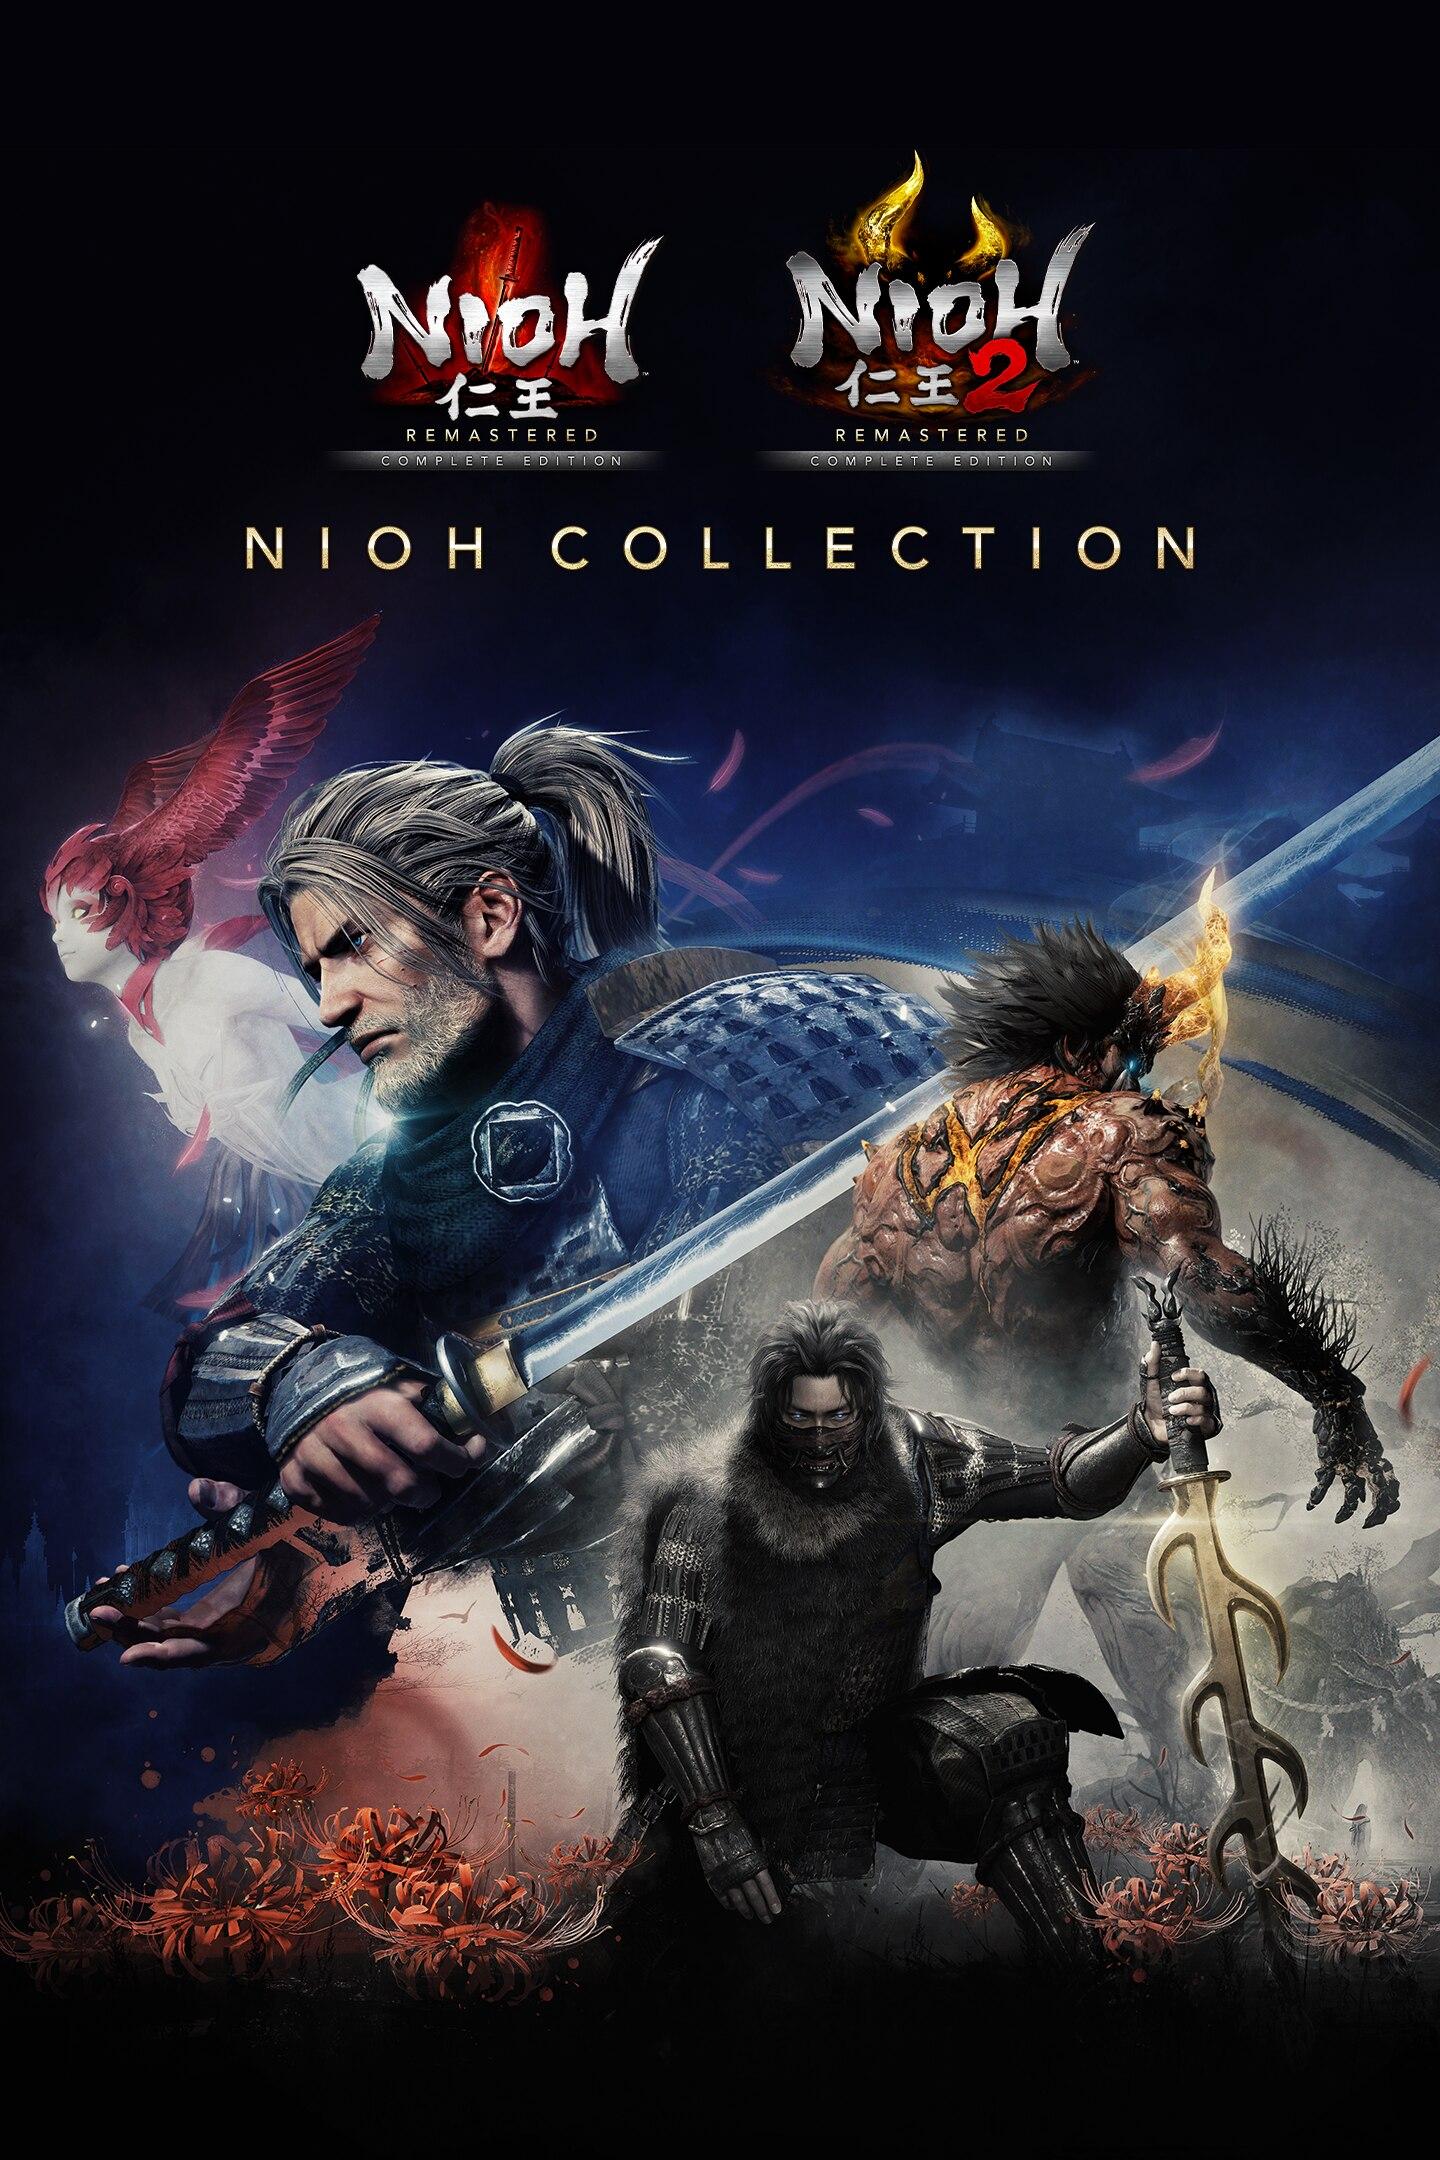 Nioh-Collection_2020_11-19-20_012